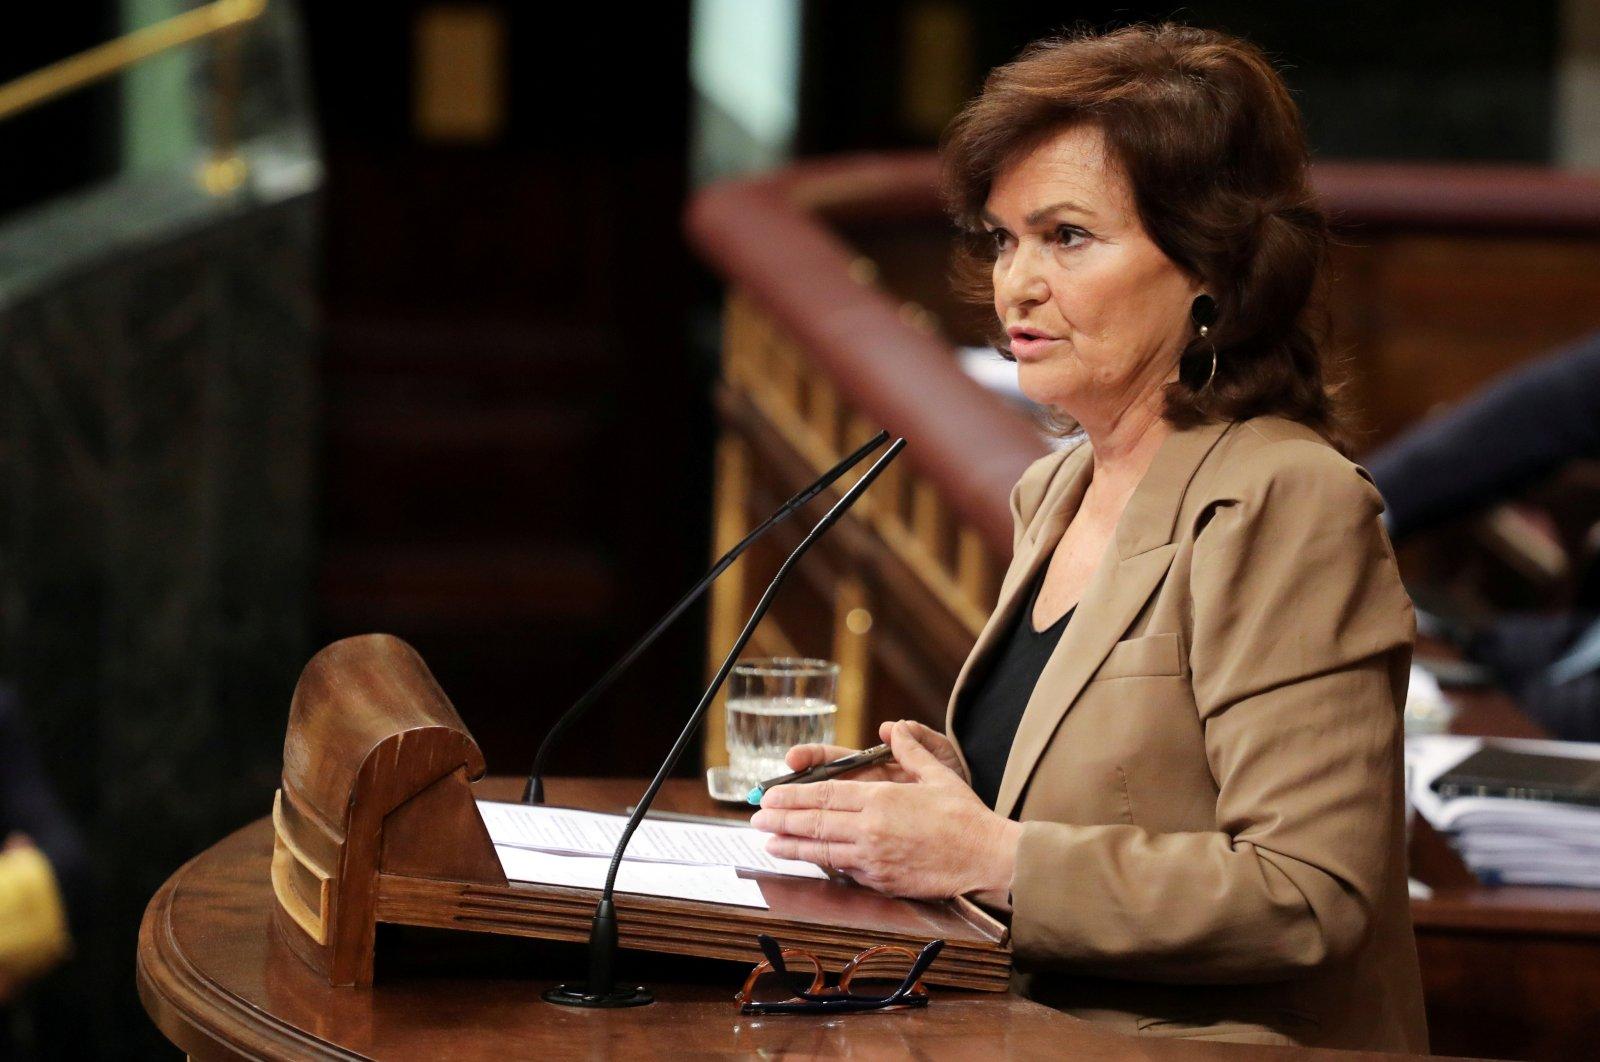 Spain's deputy prime minister Carmen Calvo speaks in parliament in Madrid, Spain, September 13, 2018. (Reuters Photo)